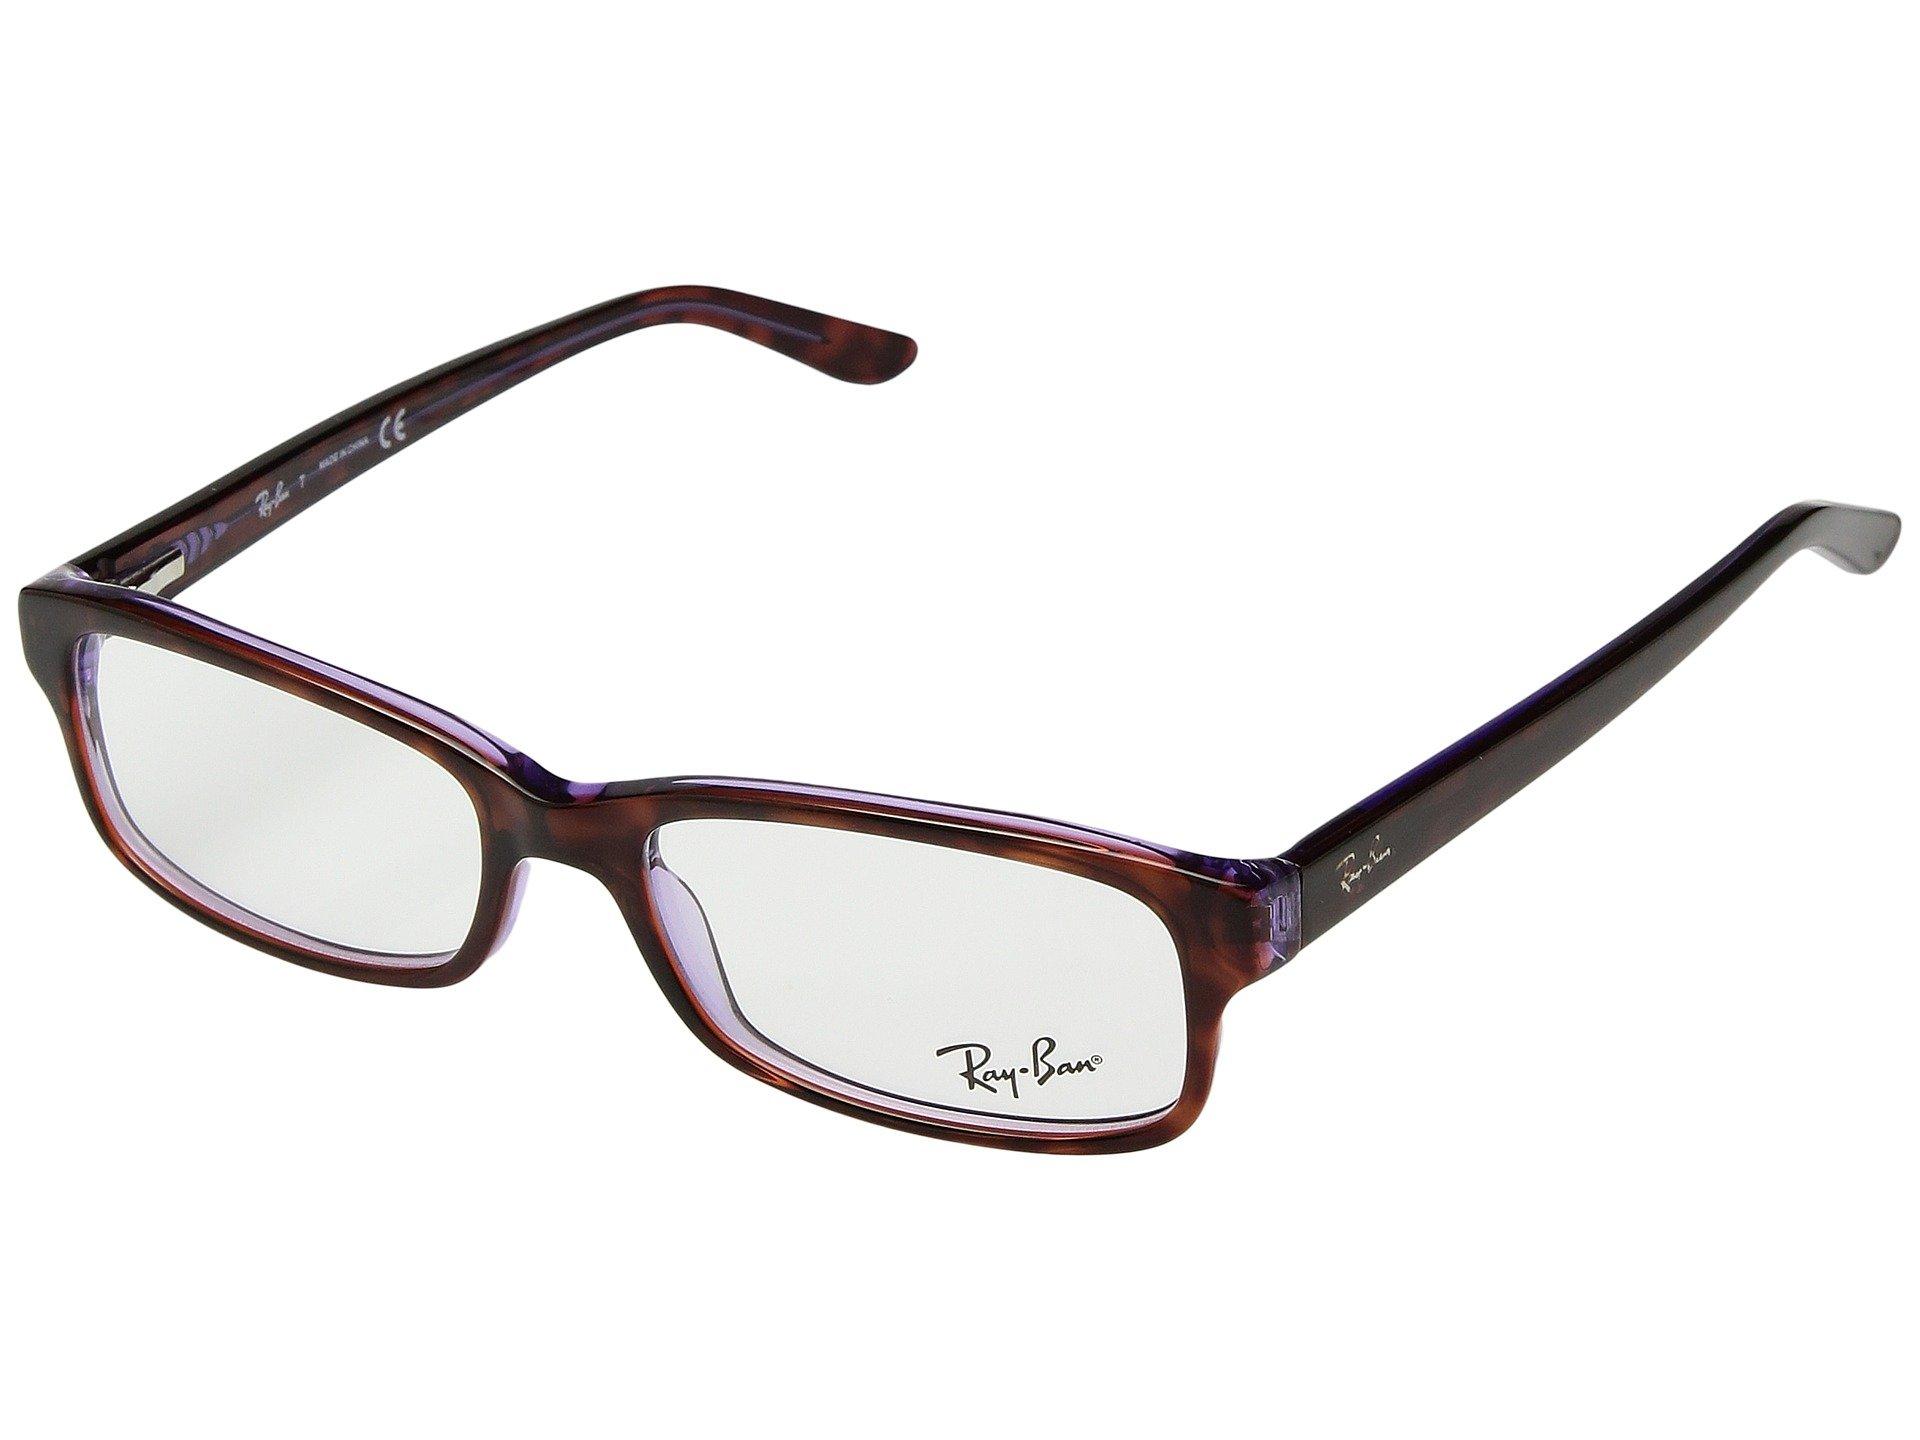 Gafas para Hombre Ray-Ban 0RX5187 52mm  + Ray-Ban en VeoyCompro.net